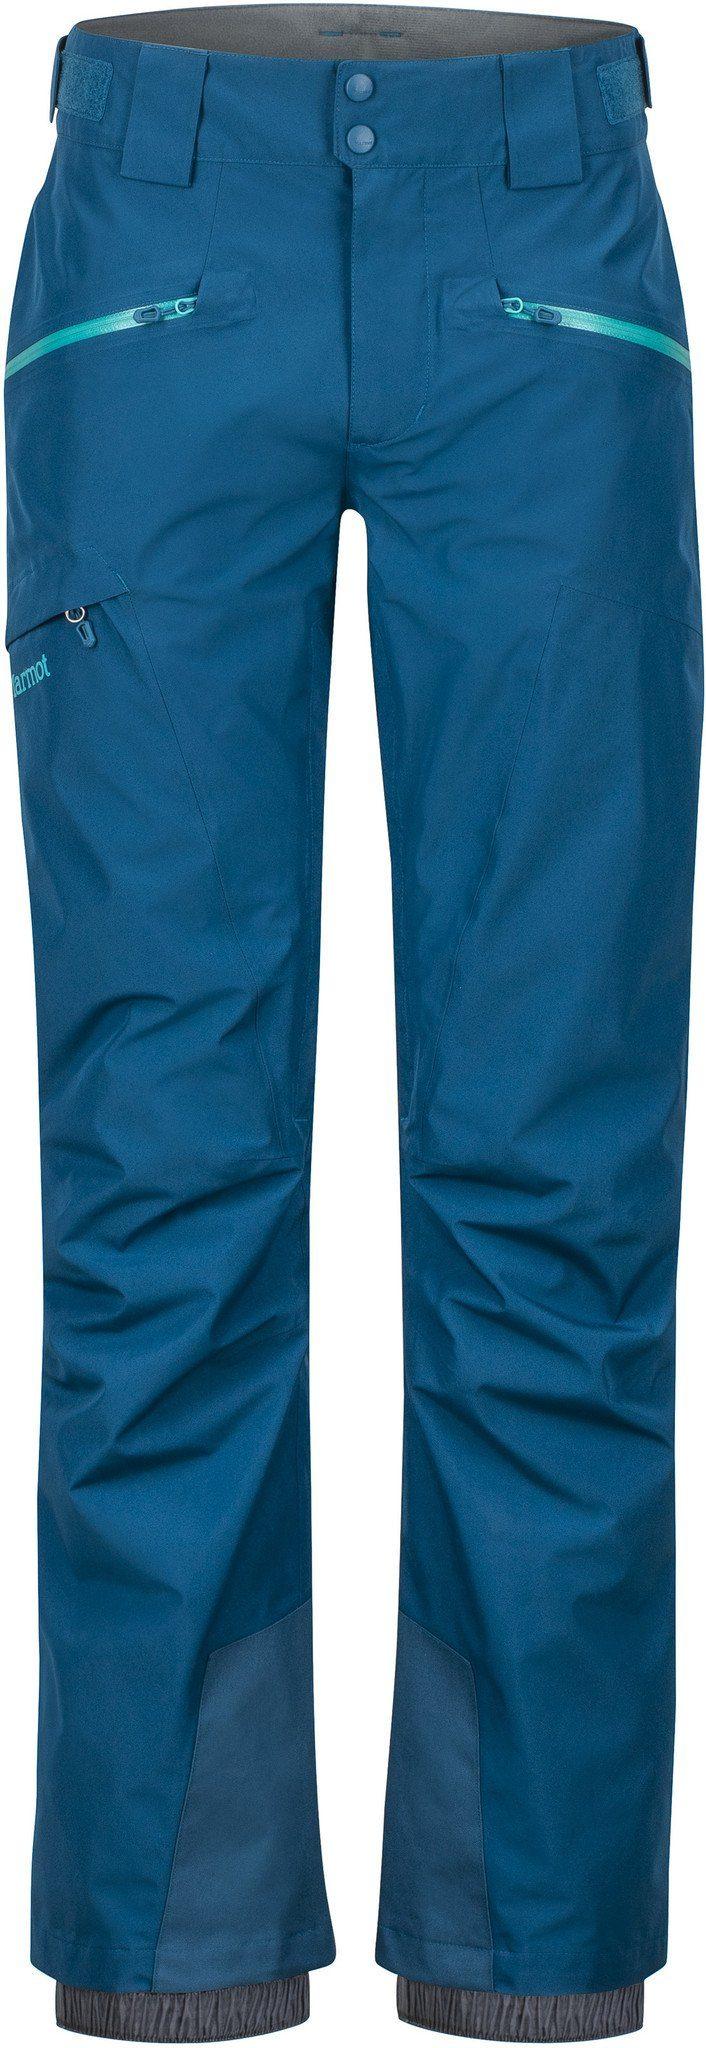 Herren Marmot Outdoorhose »Lightray Hose Herren« blau | 00889169523687